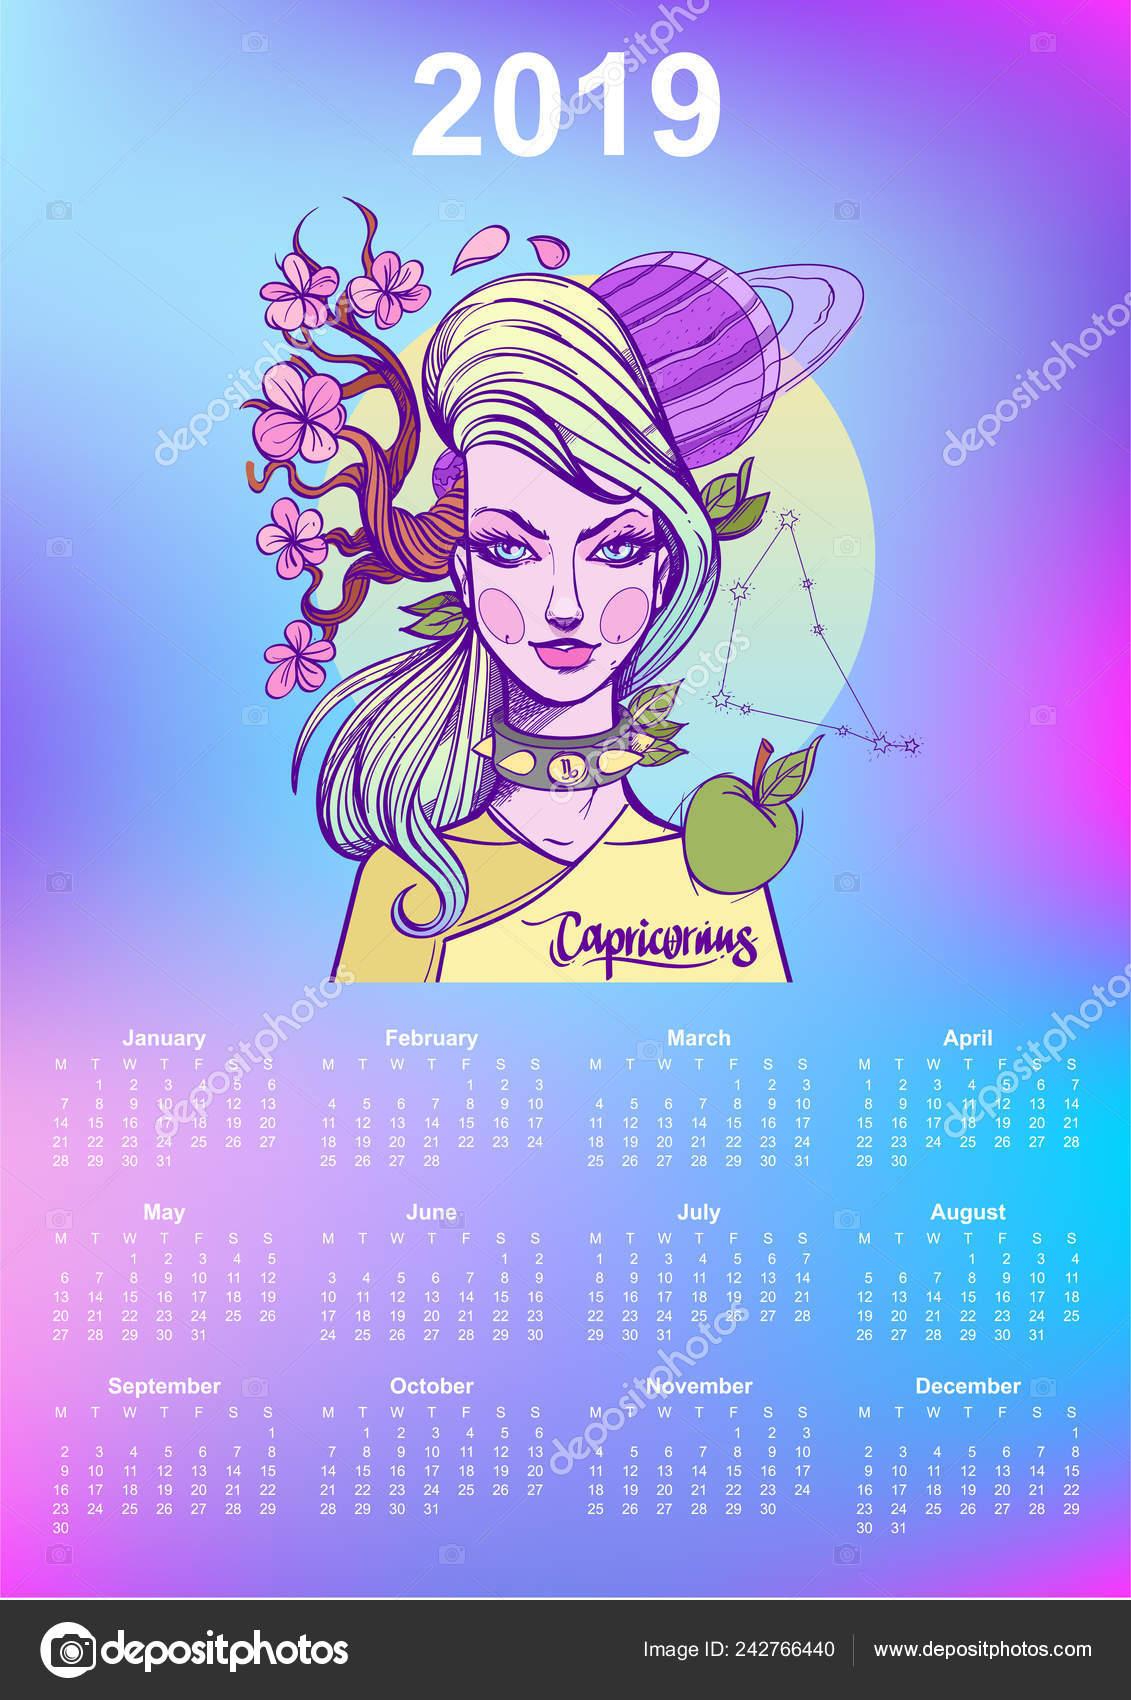 Calendario Zodiacale.2019 Calendario Mensile Capricorno Segno Zodiacale Regalo